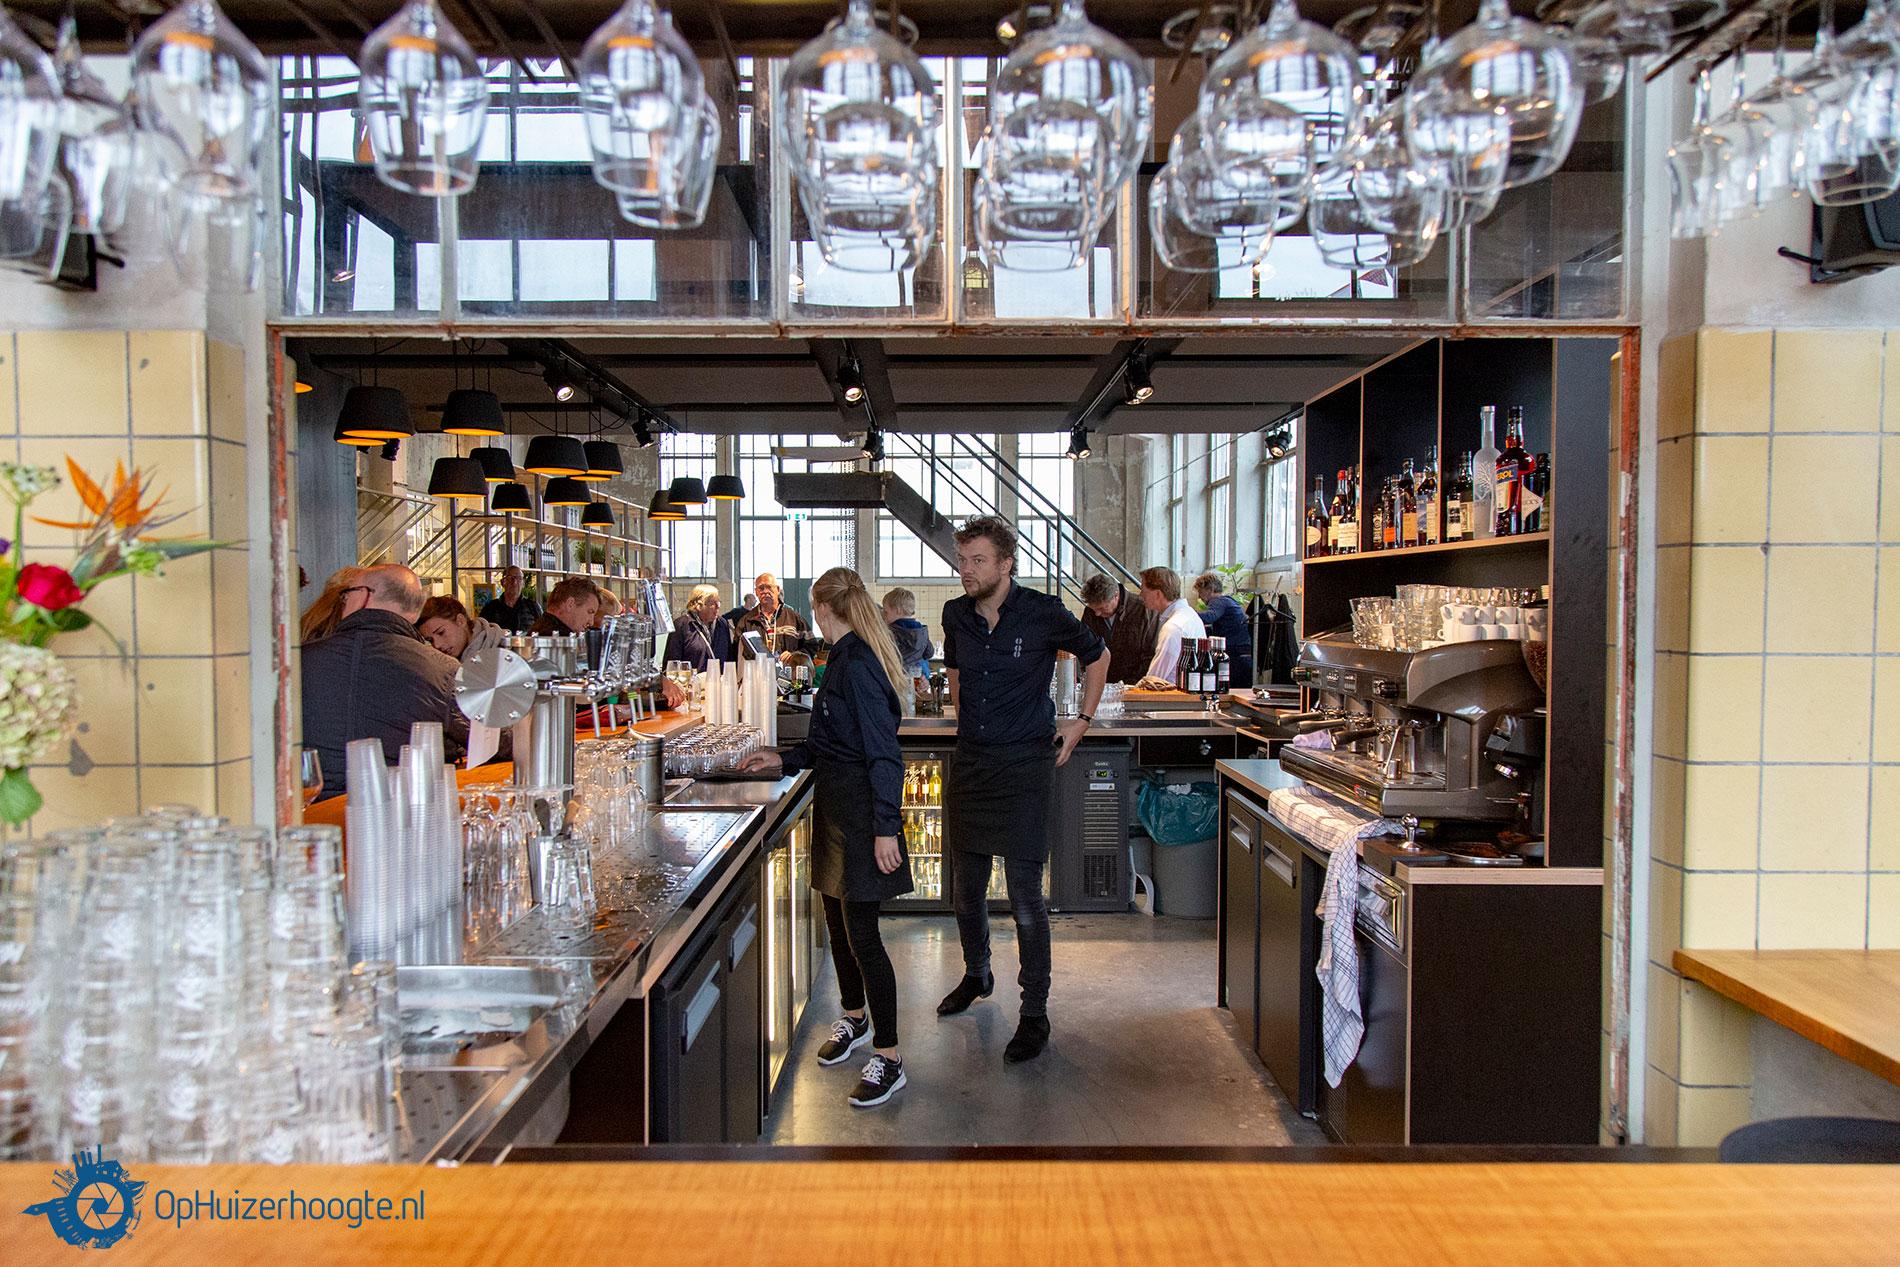 Restaurants In Huizen : Music & lifestyle festival ophuizerhoogte.nl